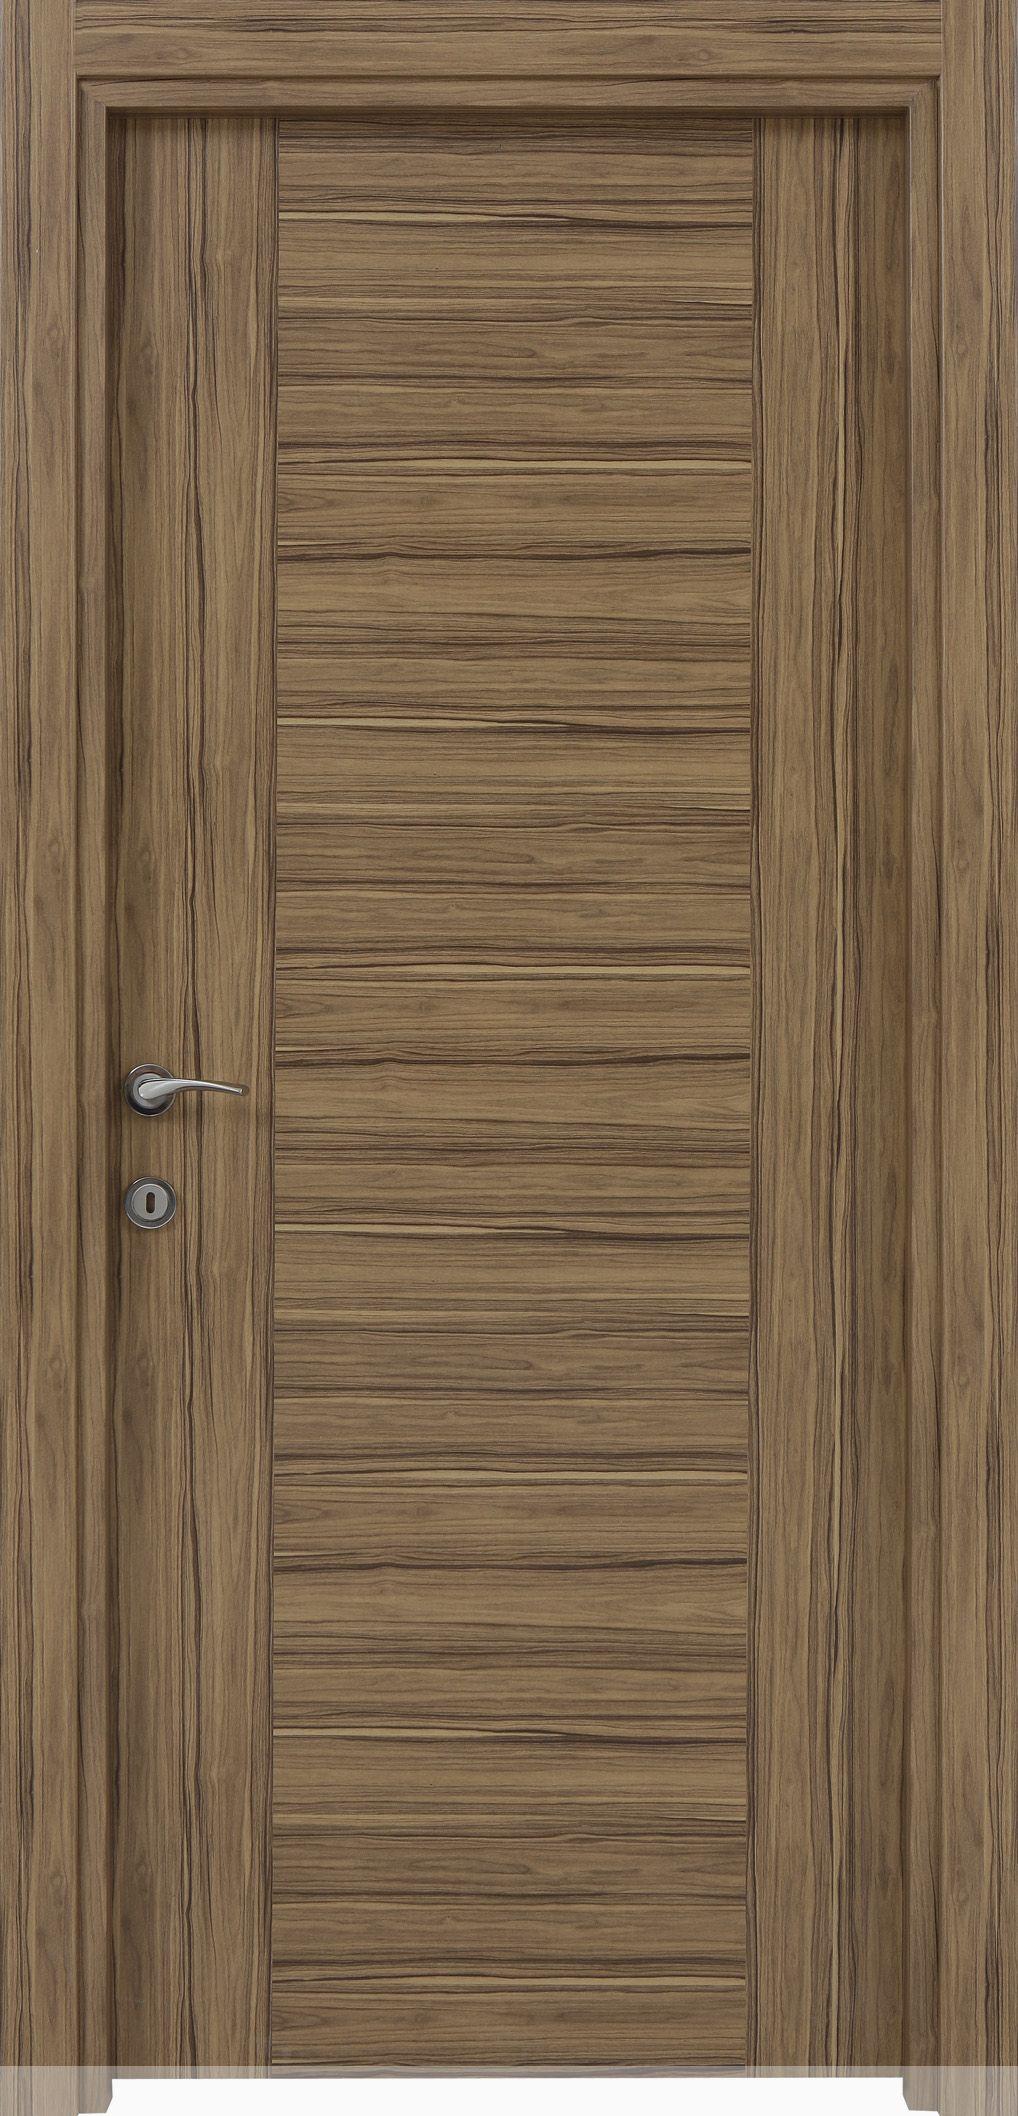 Turkish Pvc Composite Interior Doors